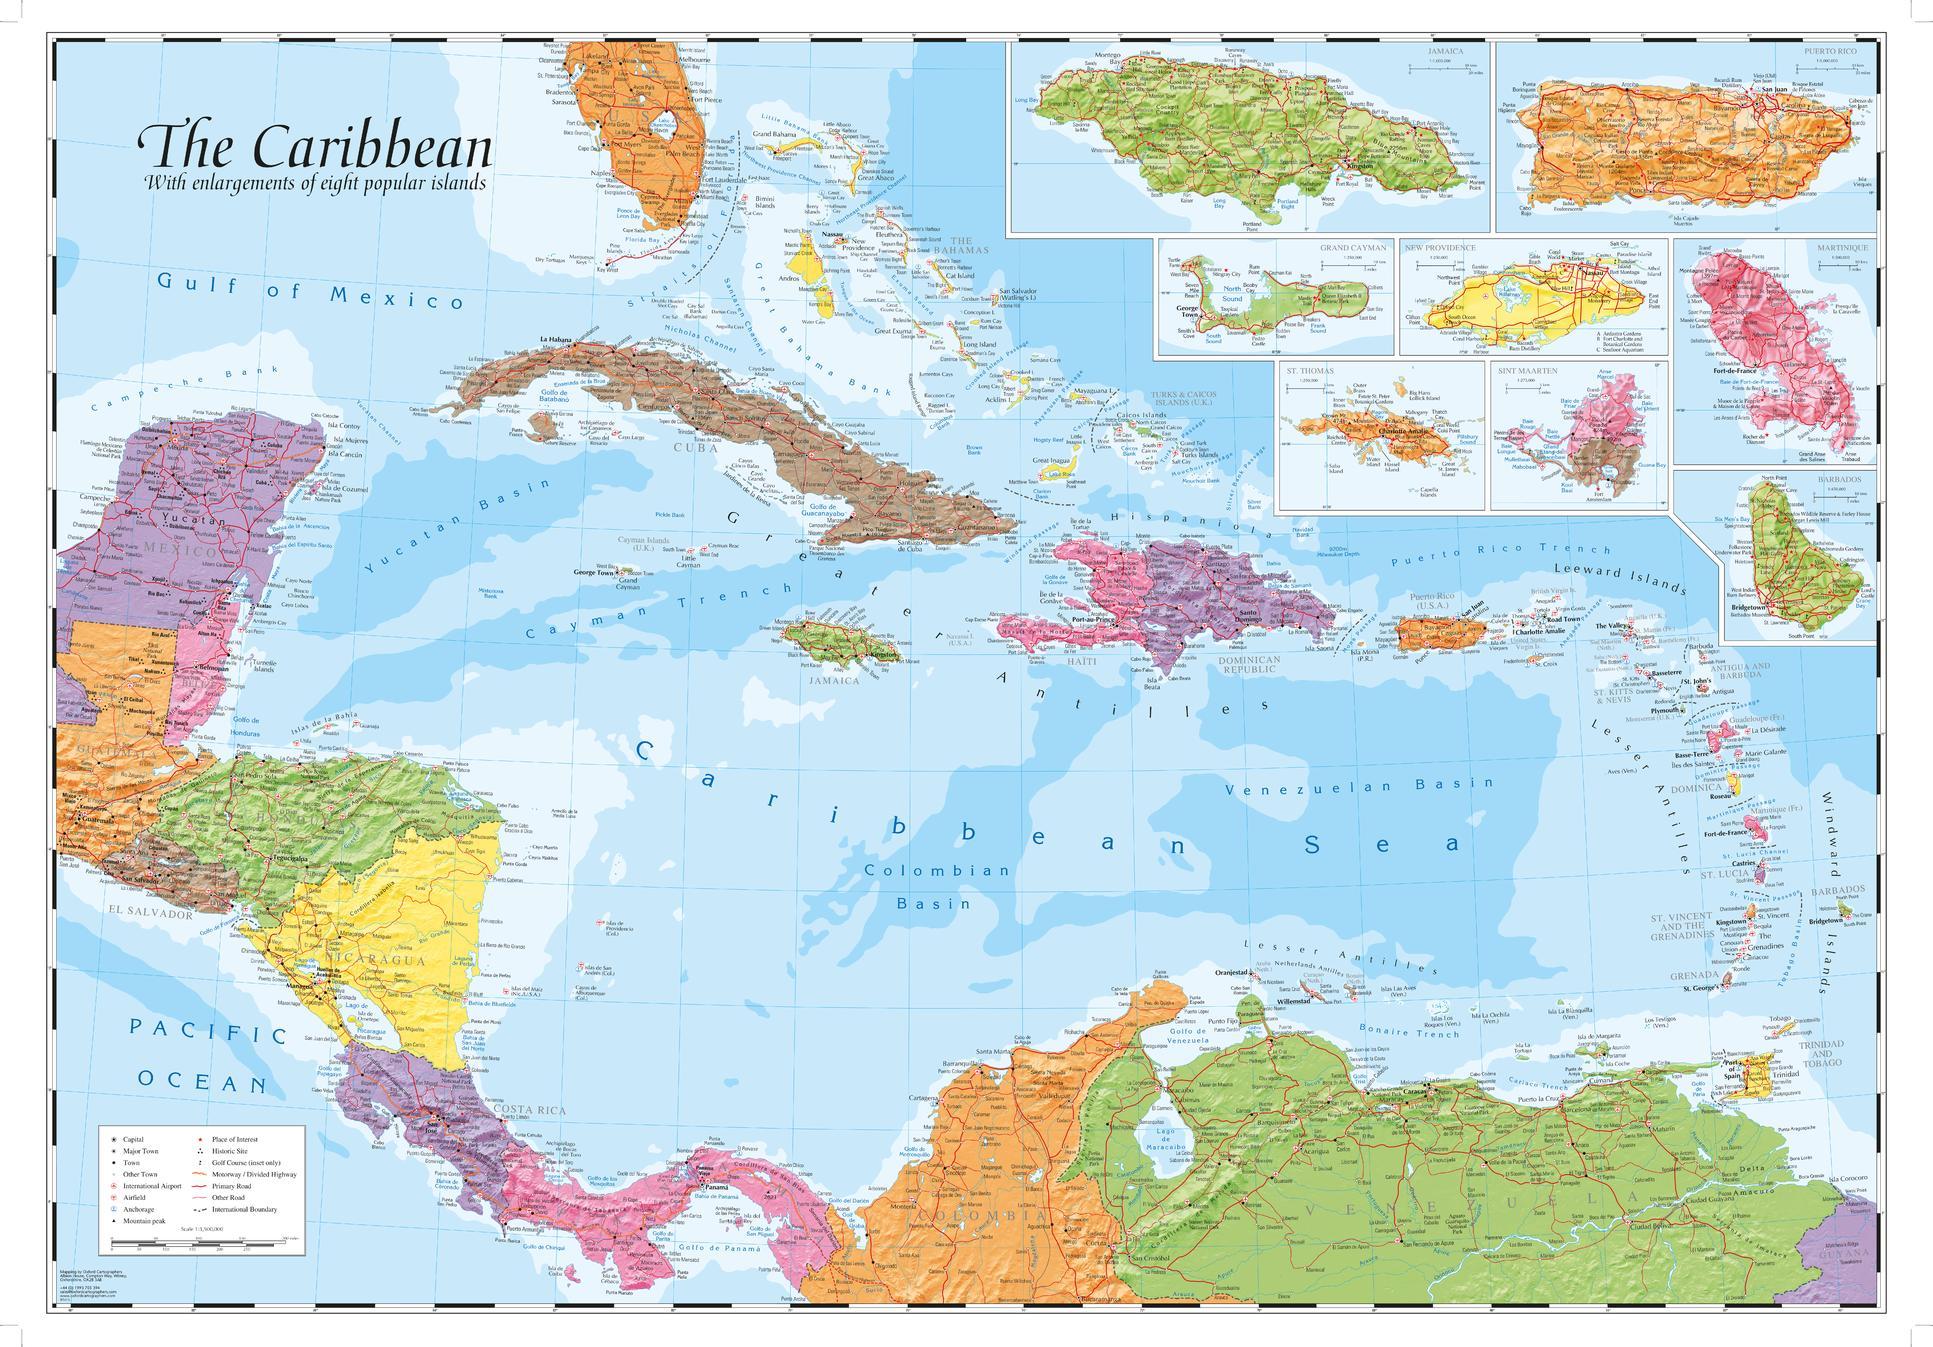 Caribbean and main islands